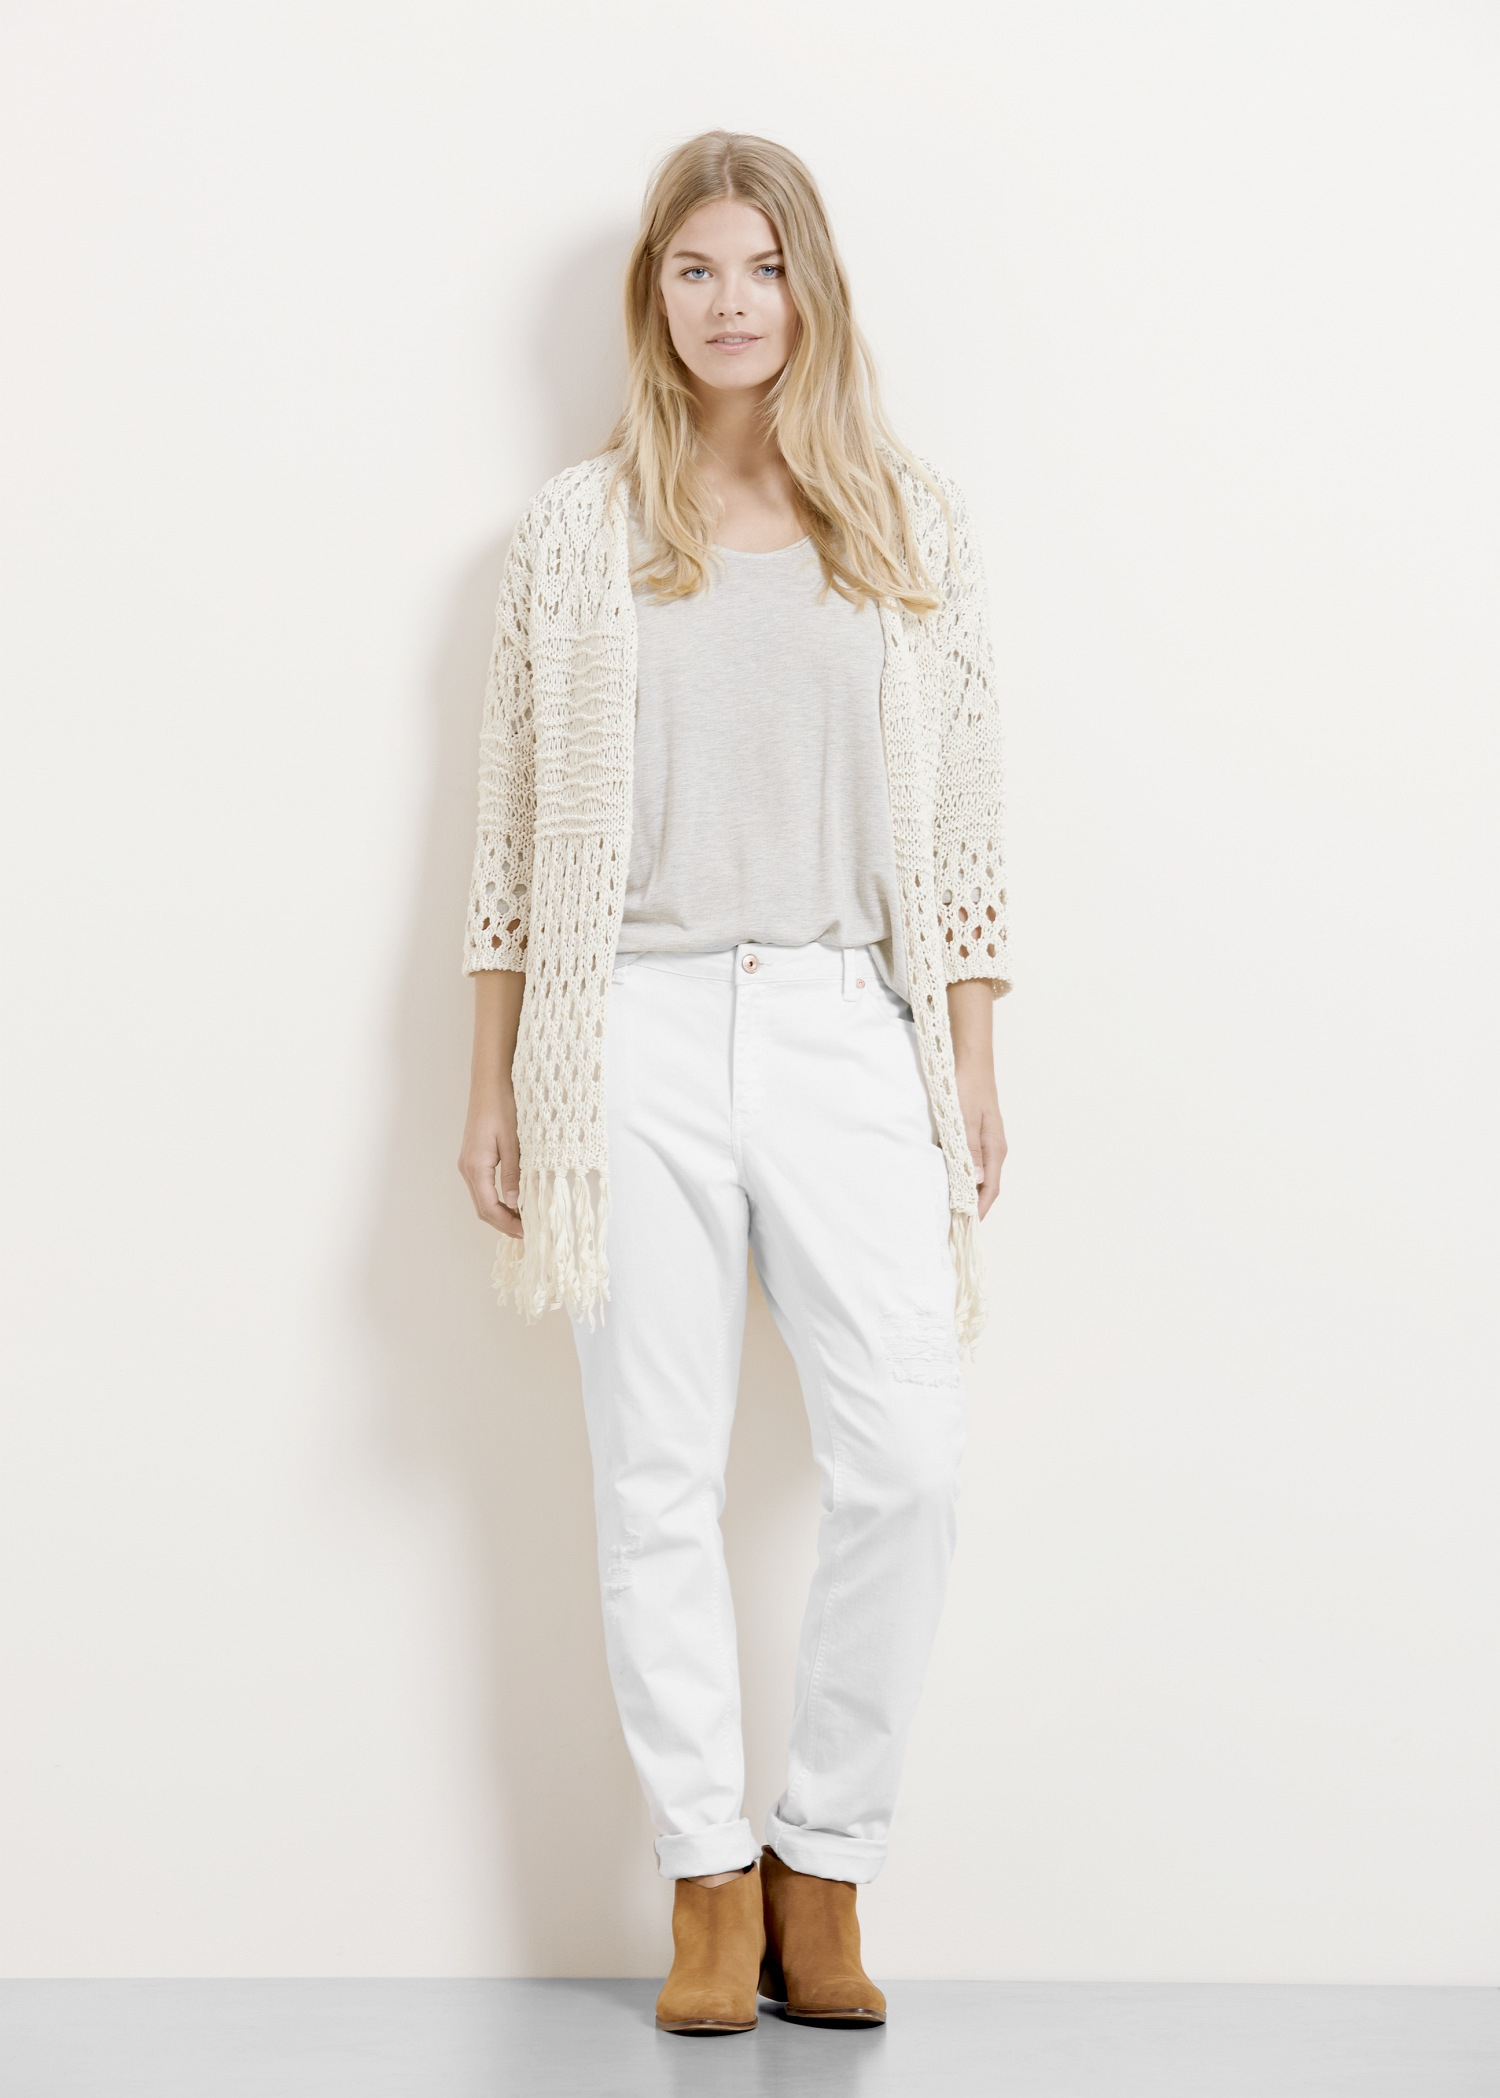 Lyst - Violeta By Mango Long Cotton Cardigan in White